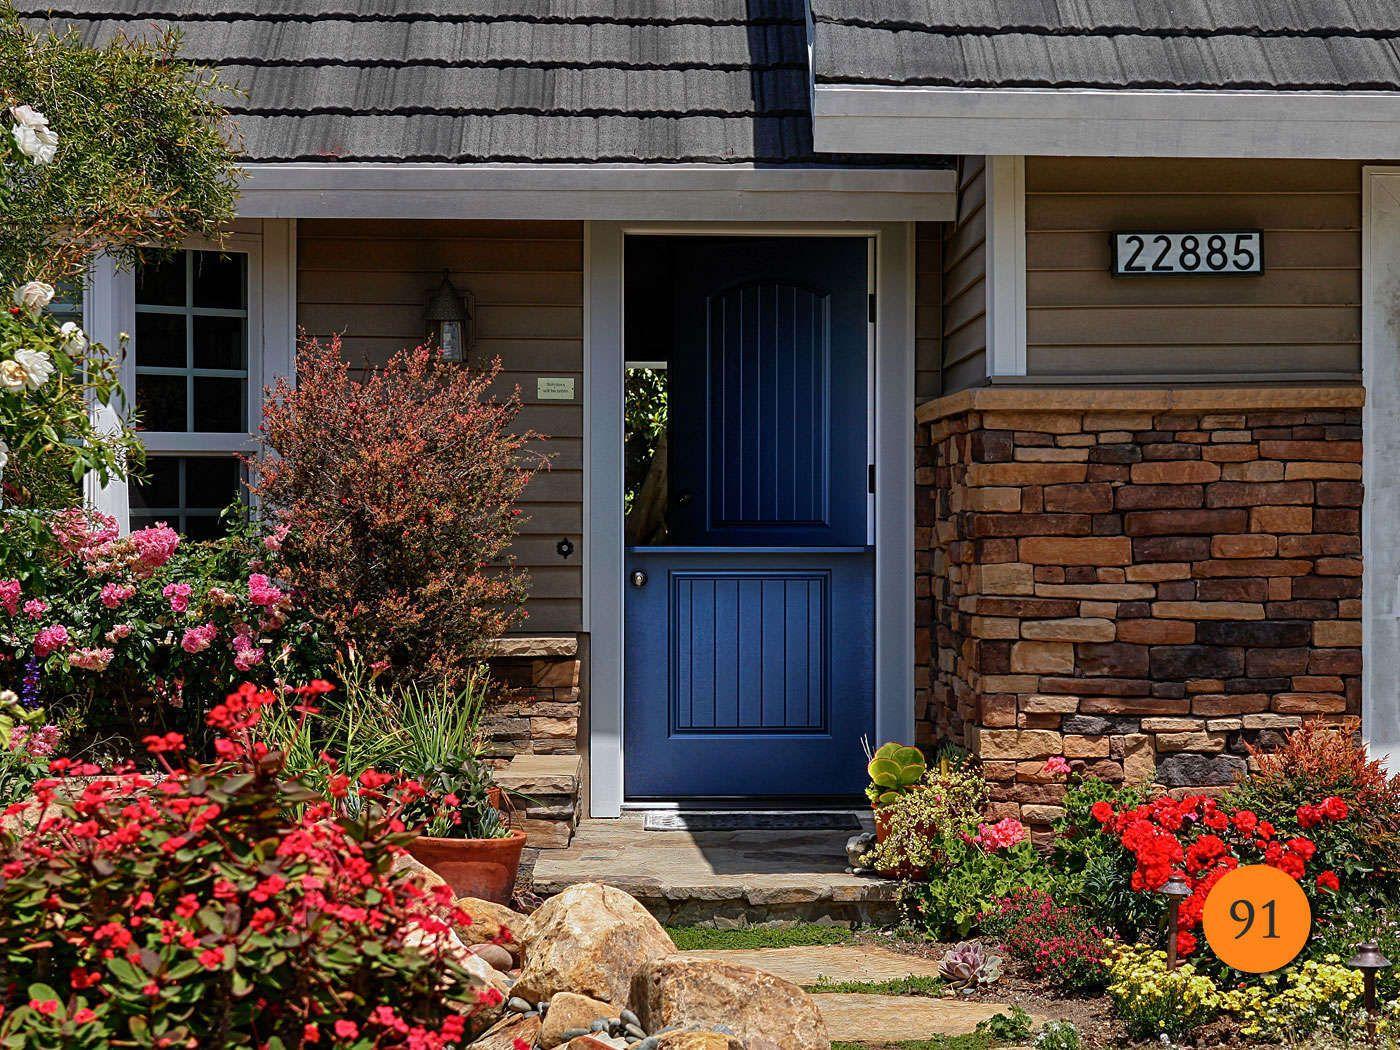 Cottage 36 X 80 Plastpro Drs2g Fiberglass Dutch Exterior Door With Shelf Installed